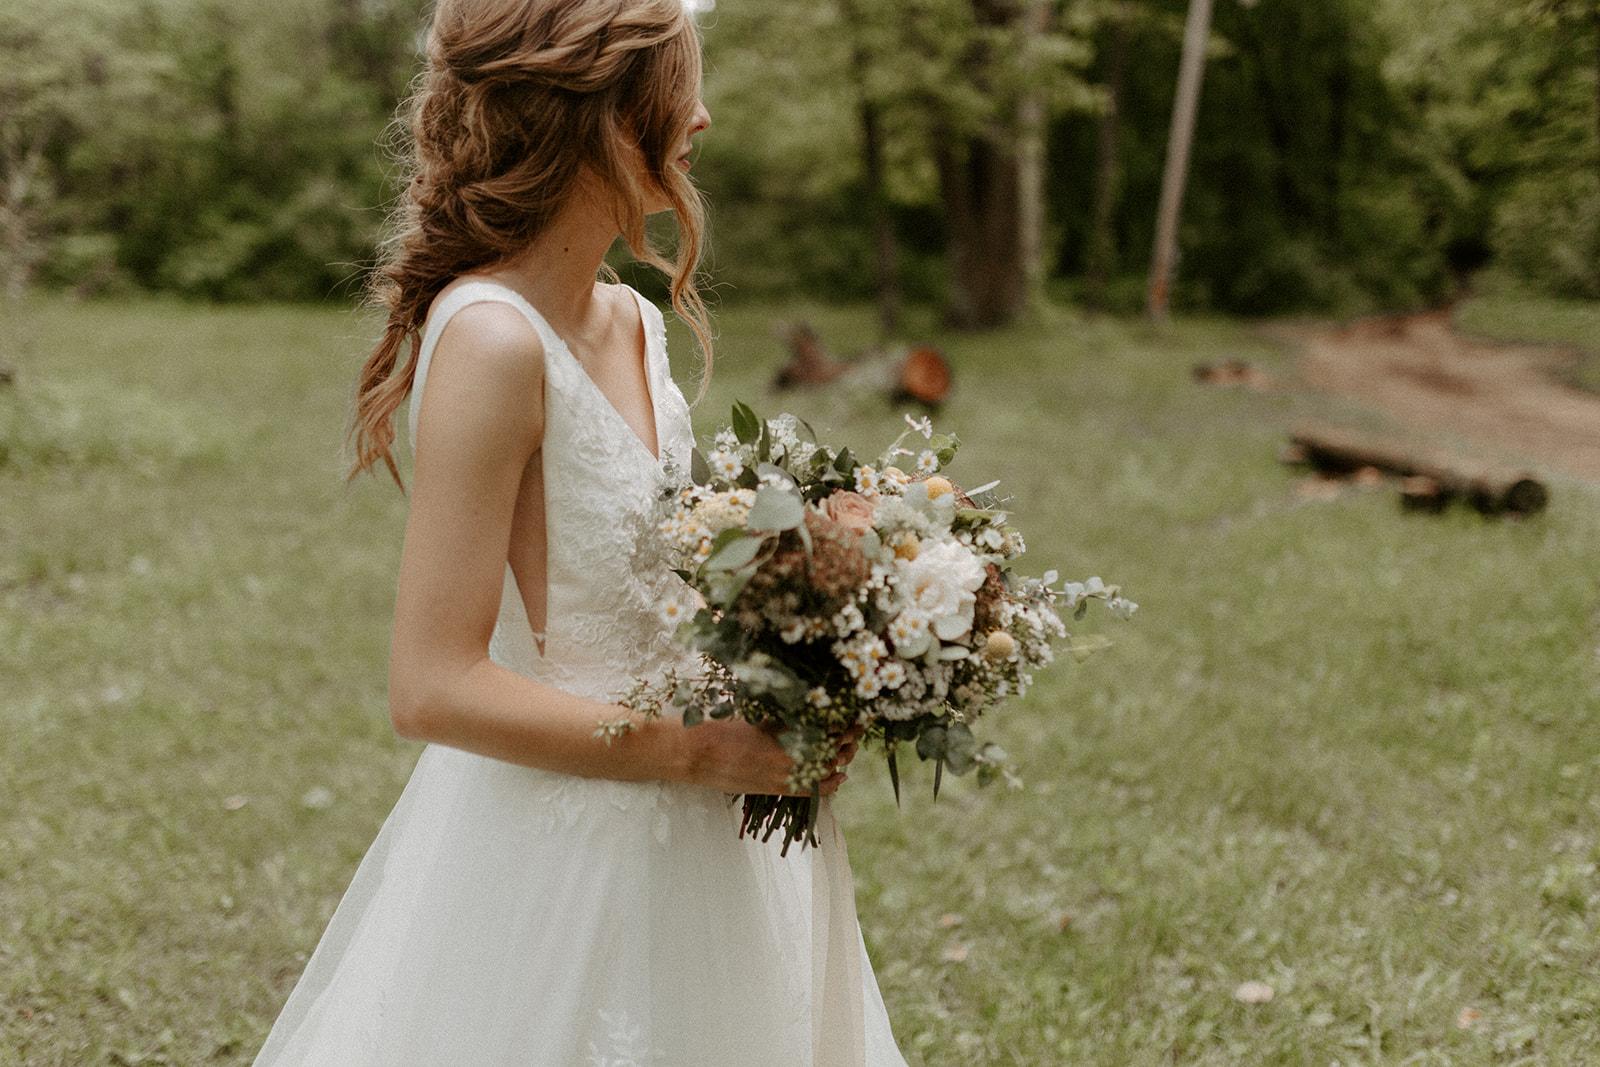 camp_wokanda_peoria_illinois_wedding_photographer_wright_photographs_bliese_0663.jpg